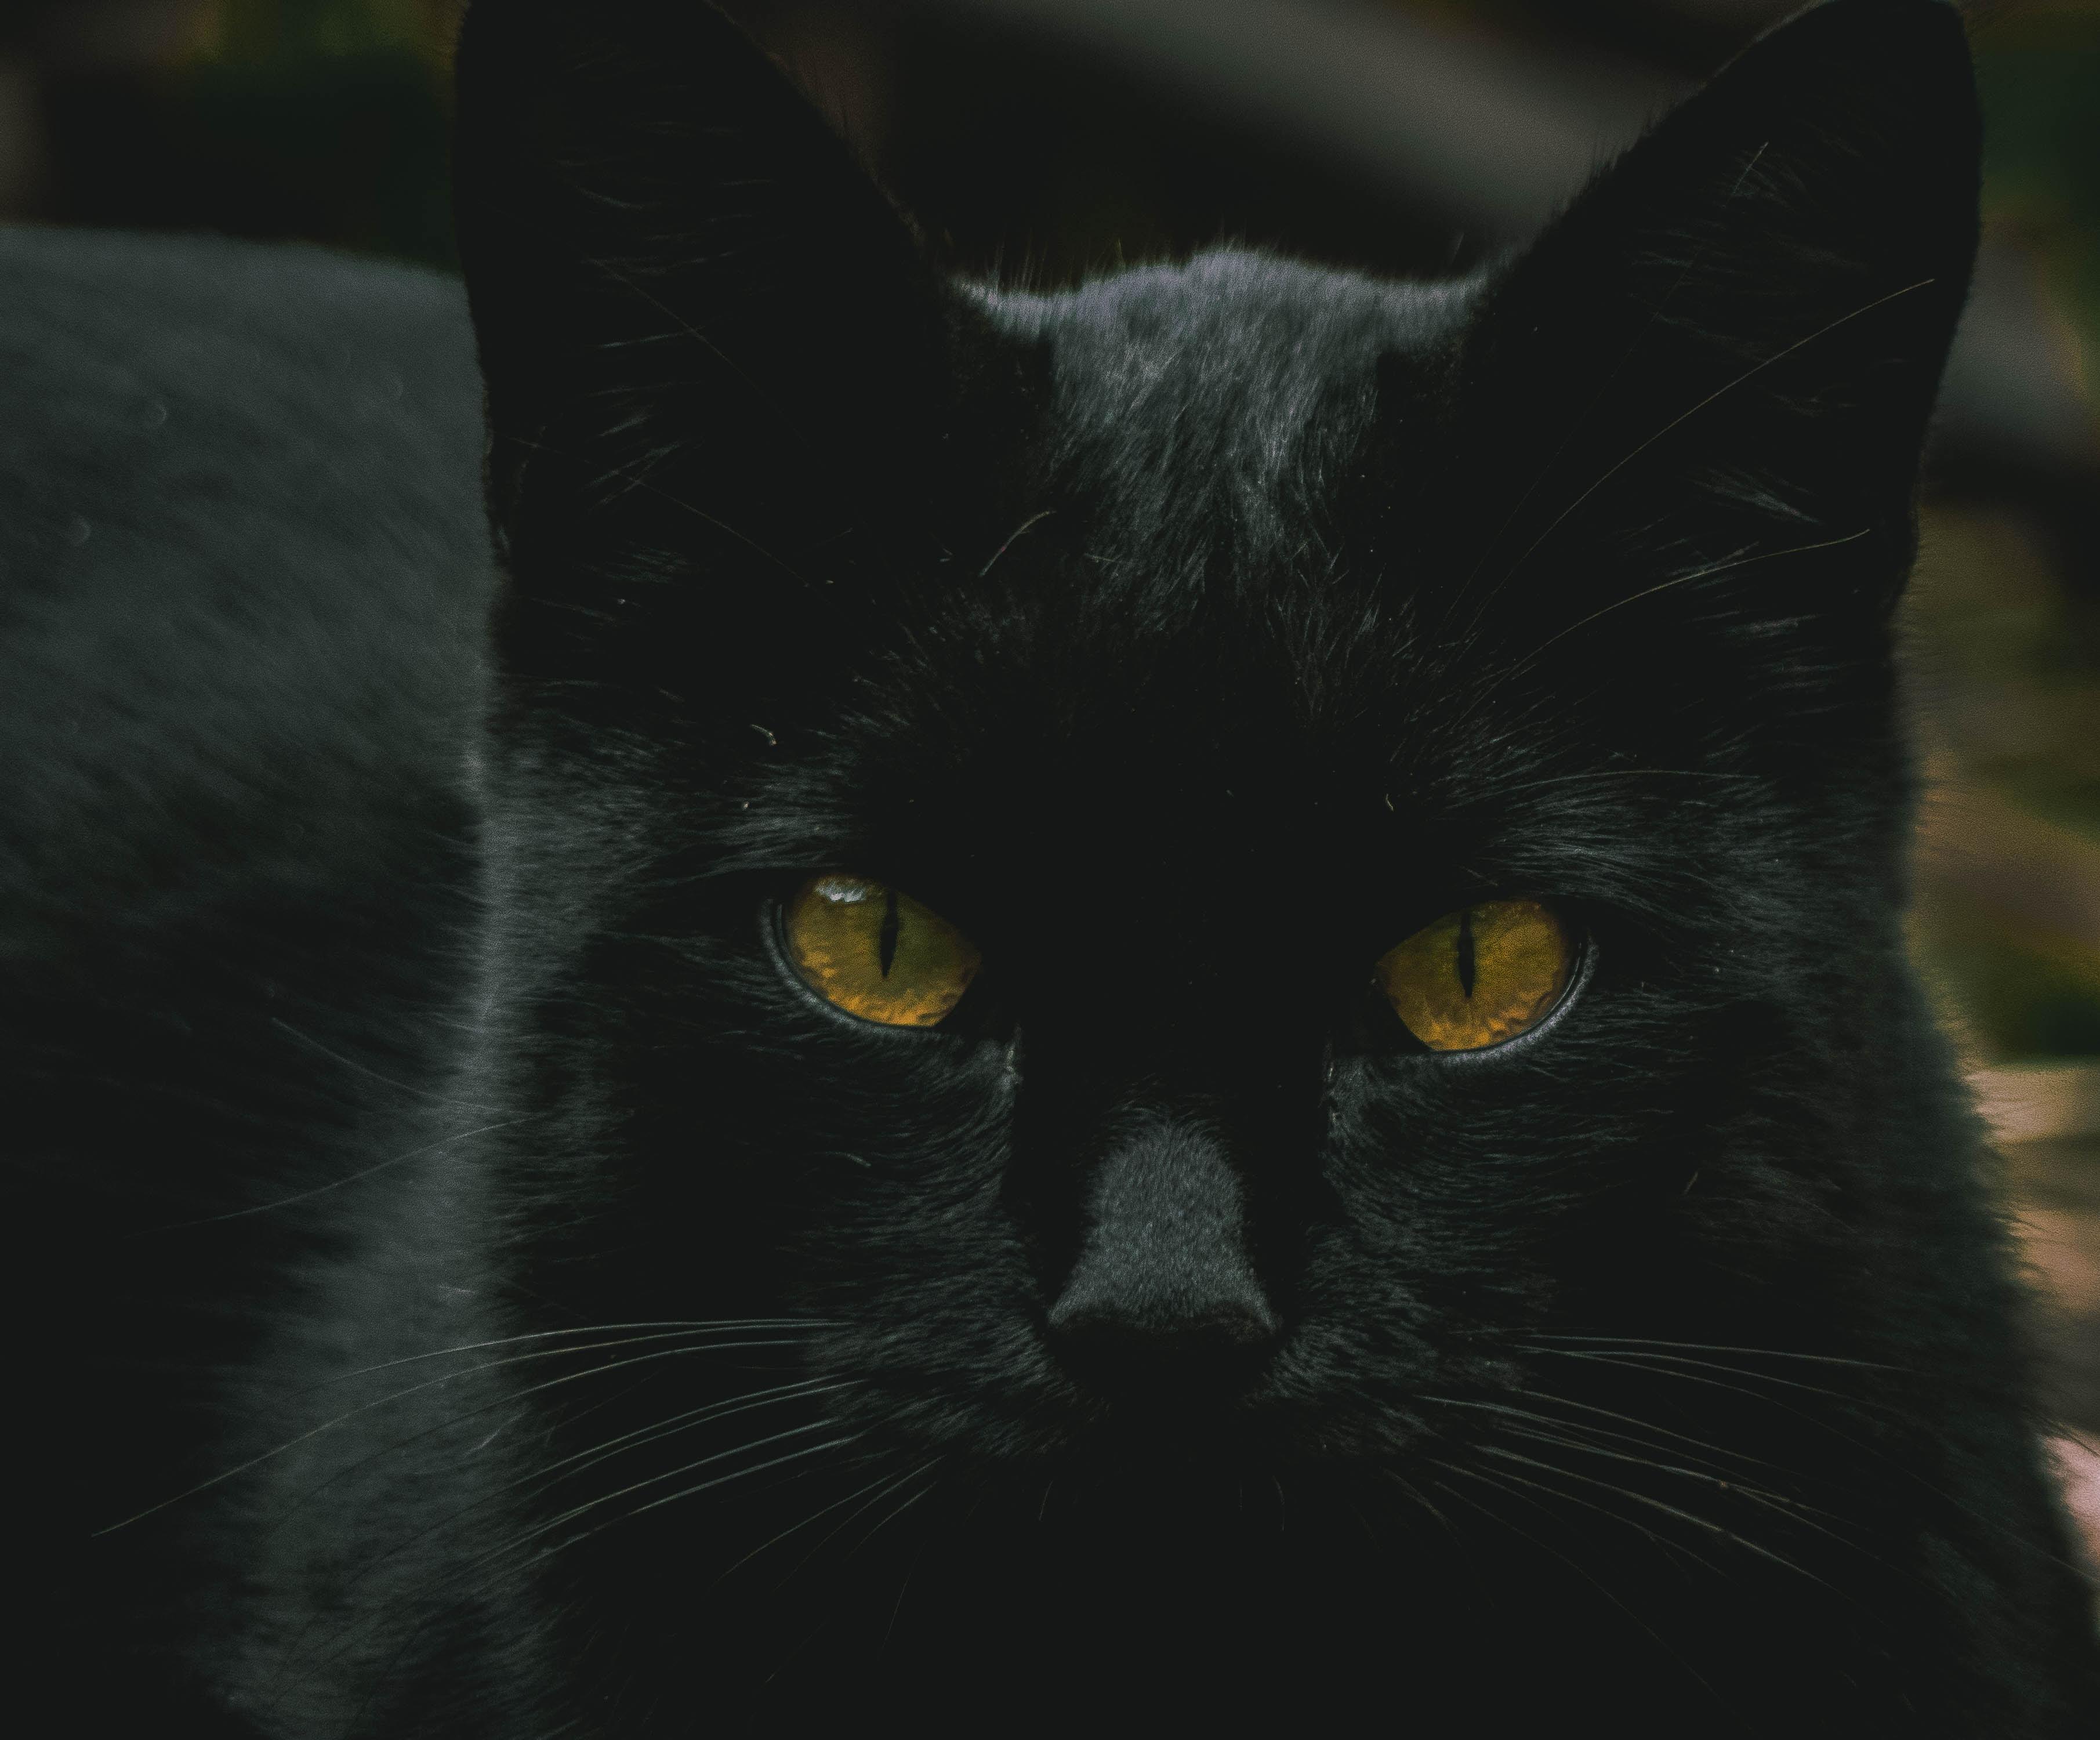 closeup of black cat